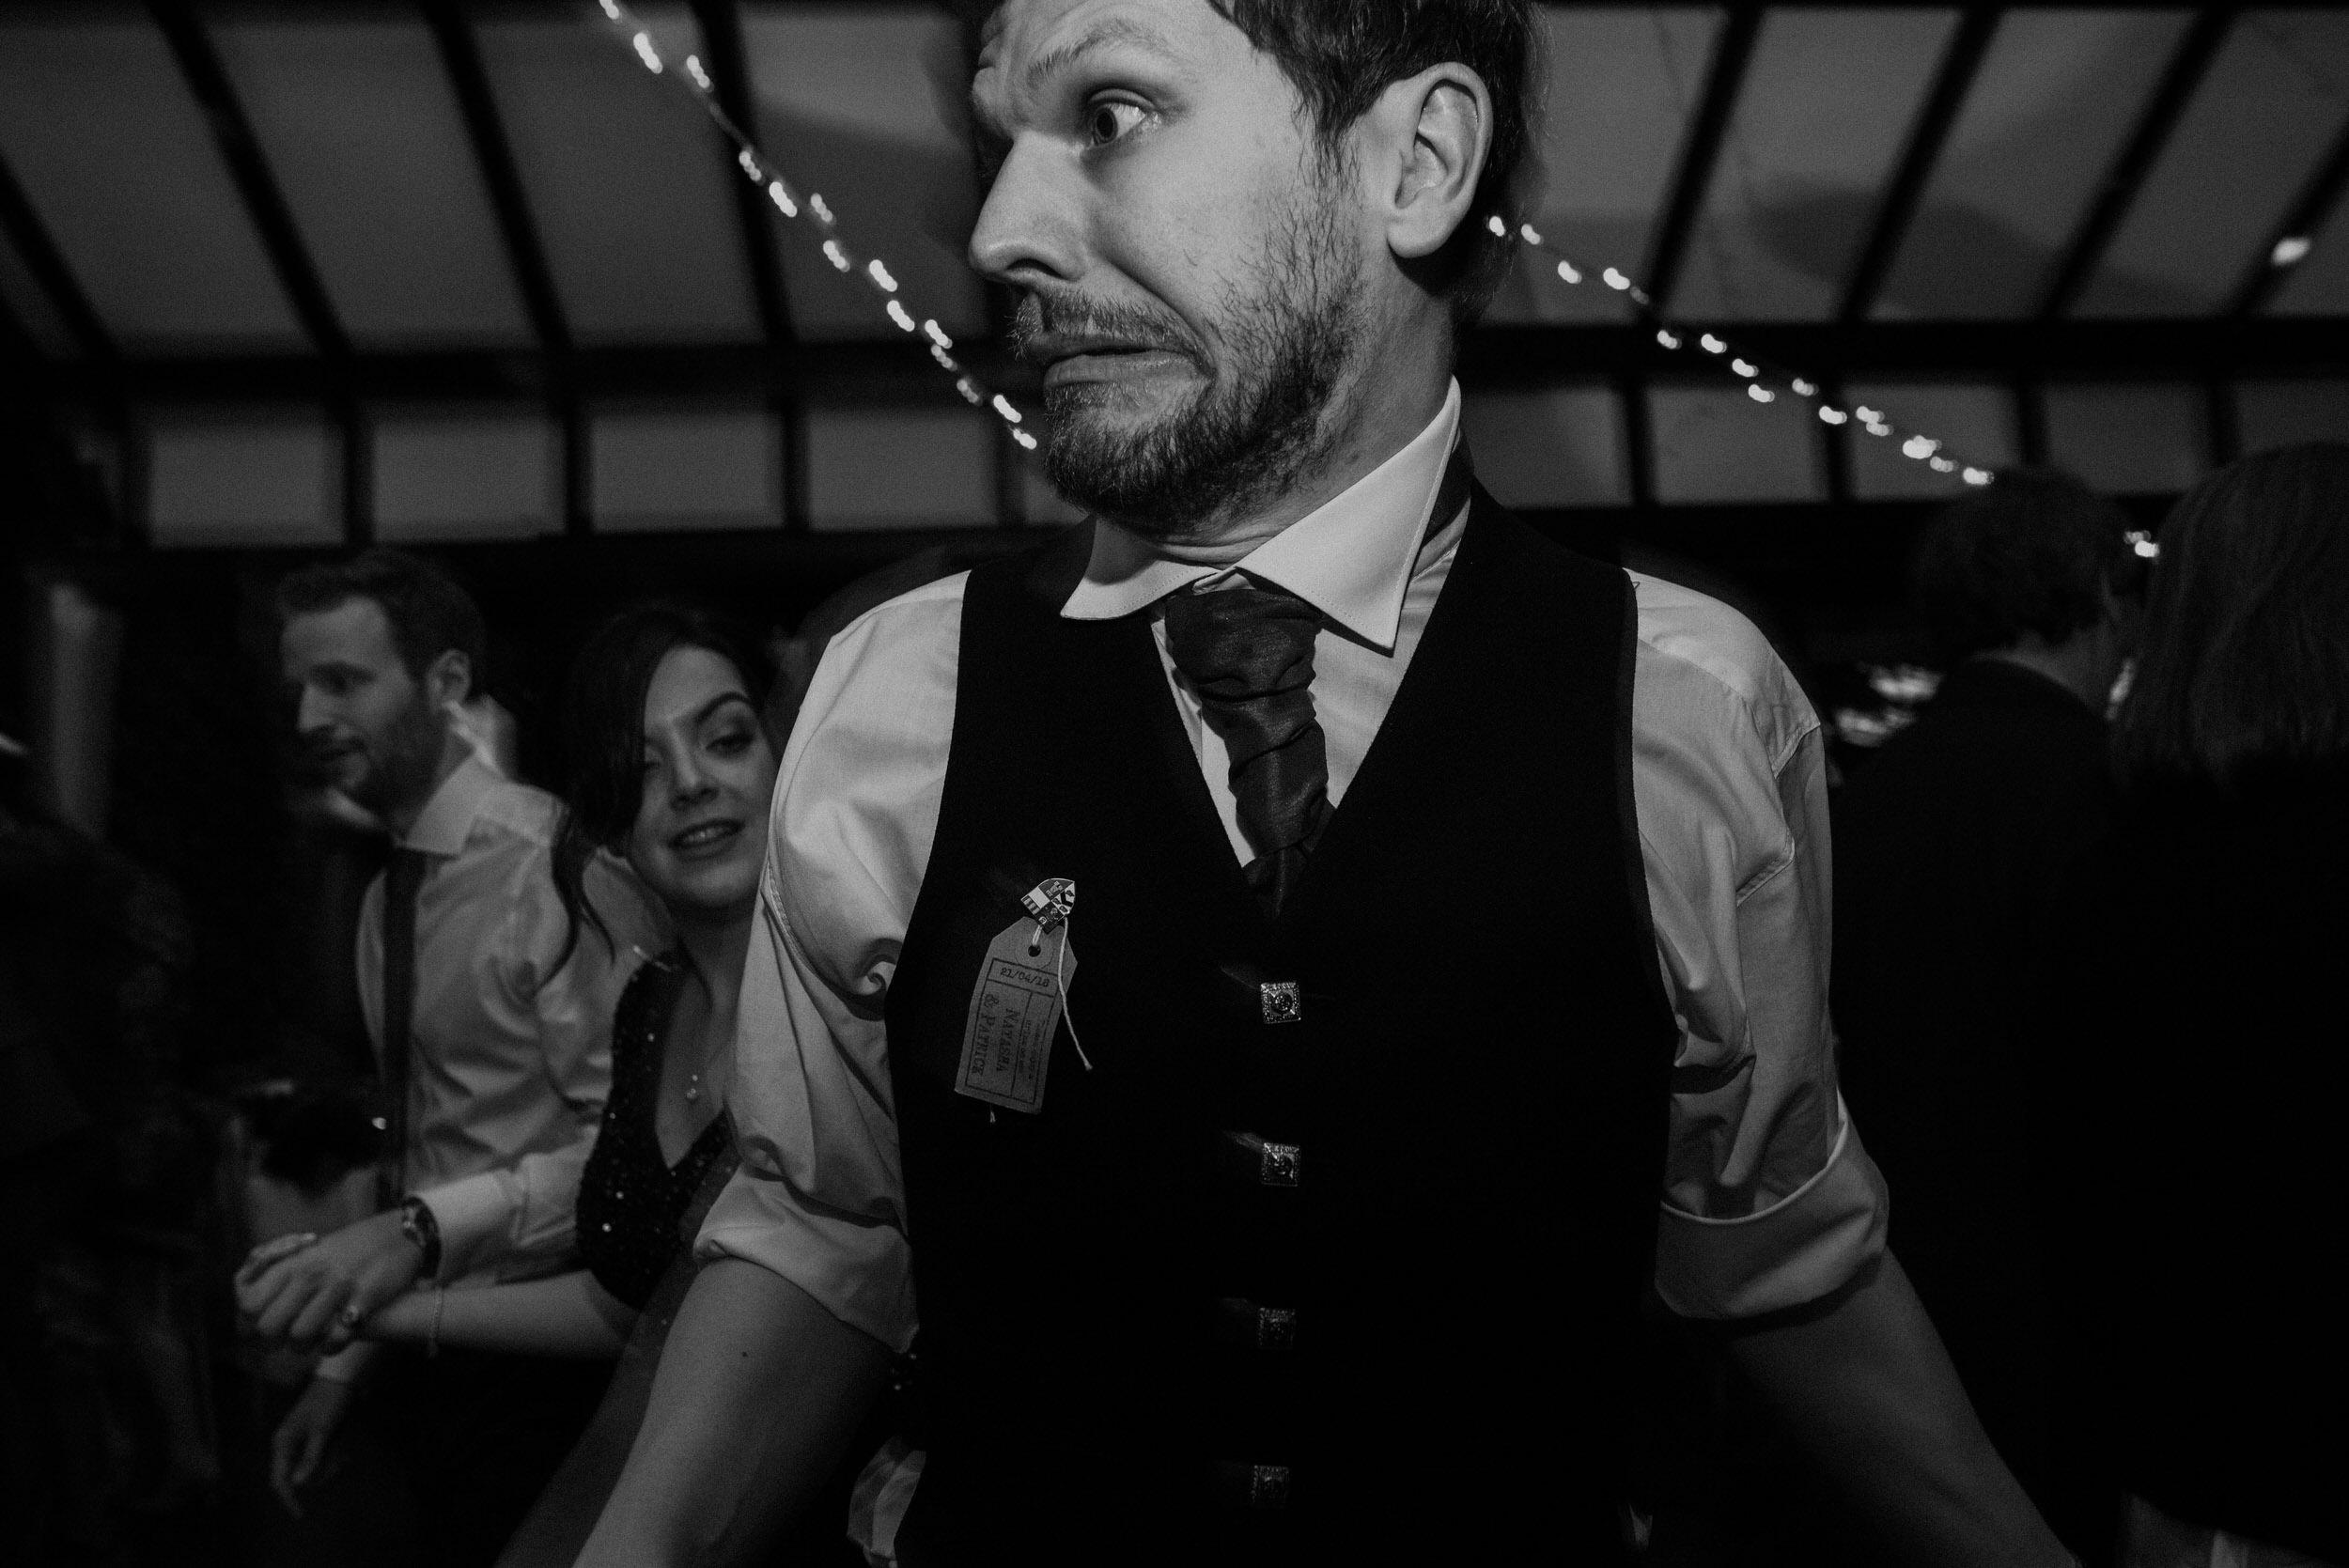 Quirky Wedding Photographer Scotland Glasgow Edinburgh Mirrorbox 246.jpg